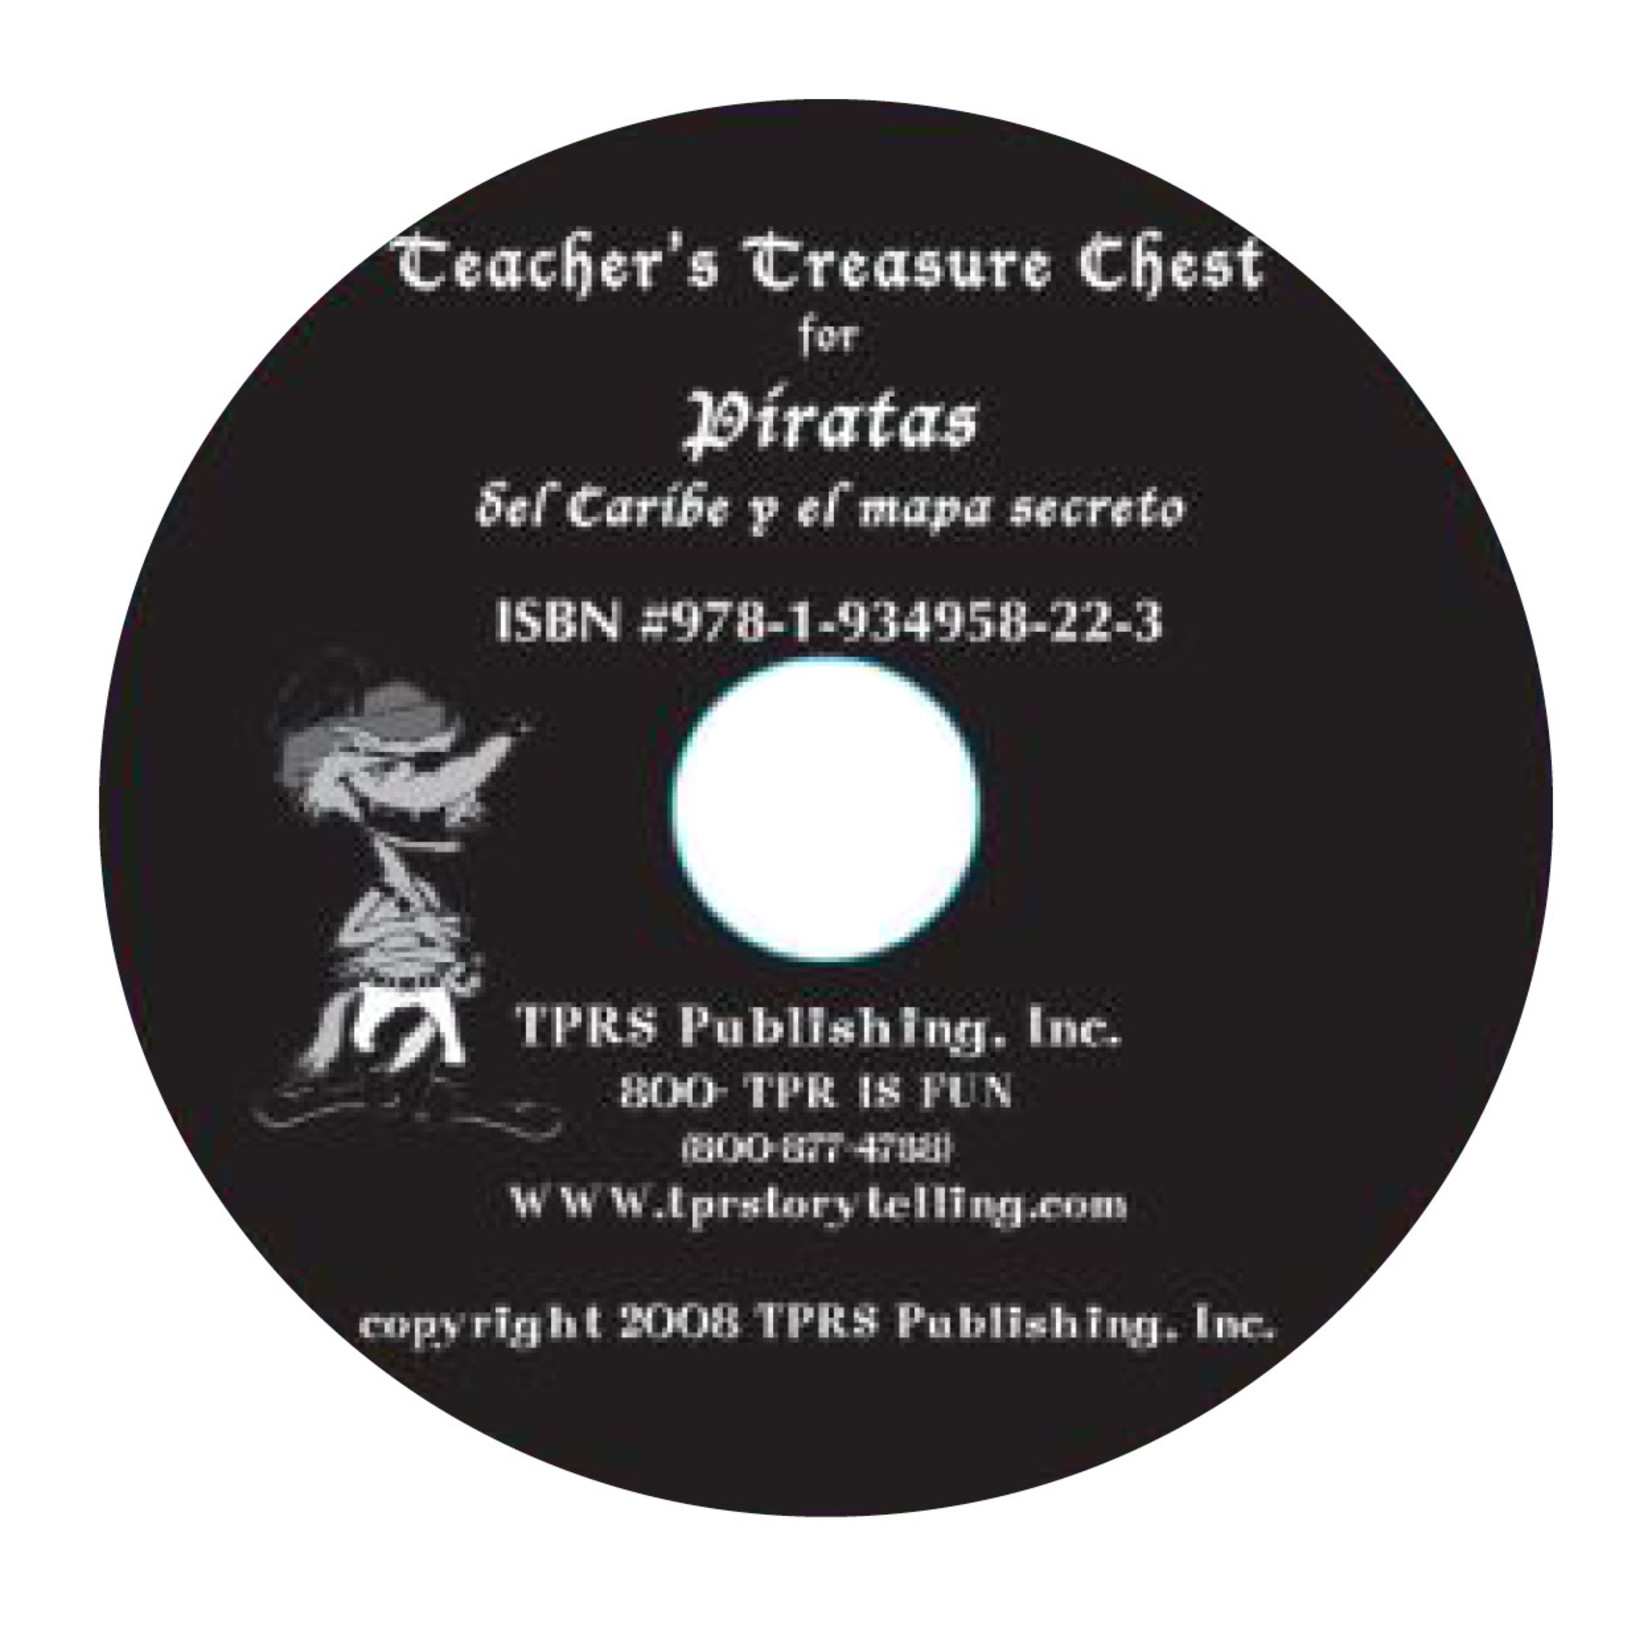 Fluency Matters Piratas del Caribe y el mapa secreto  - Teacher's Guide on CD